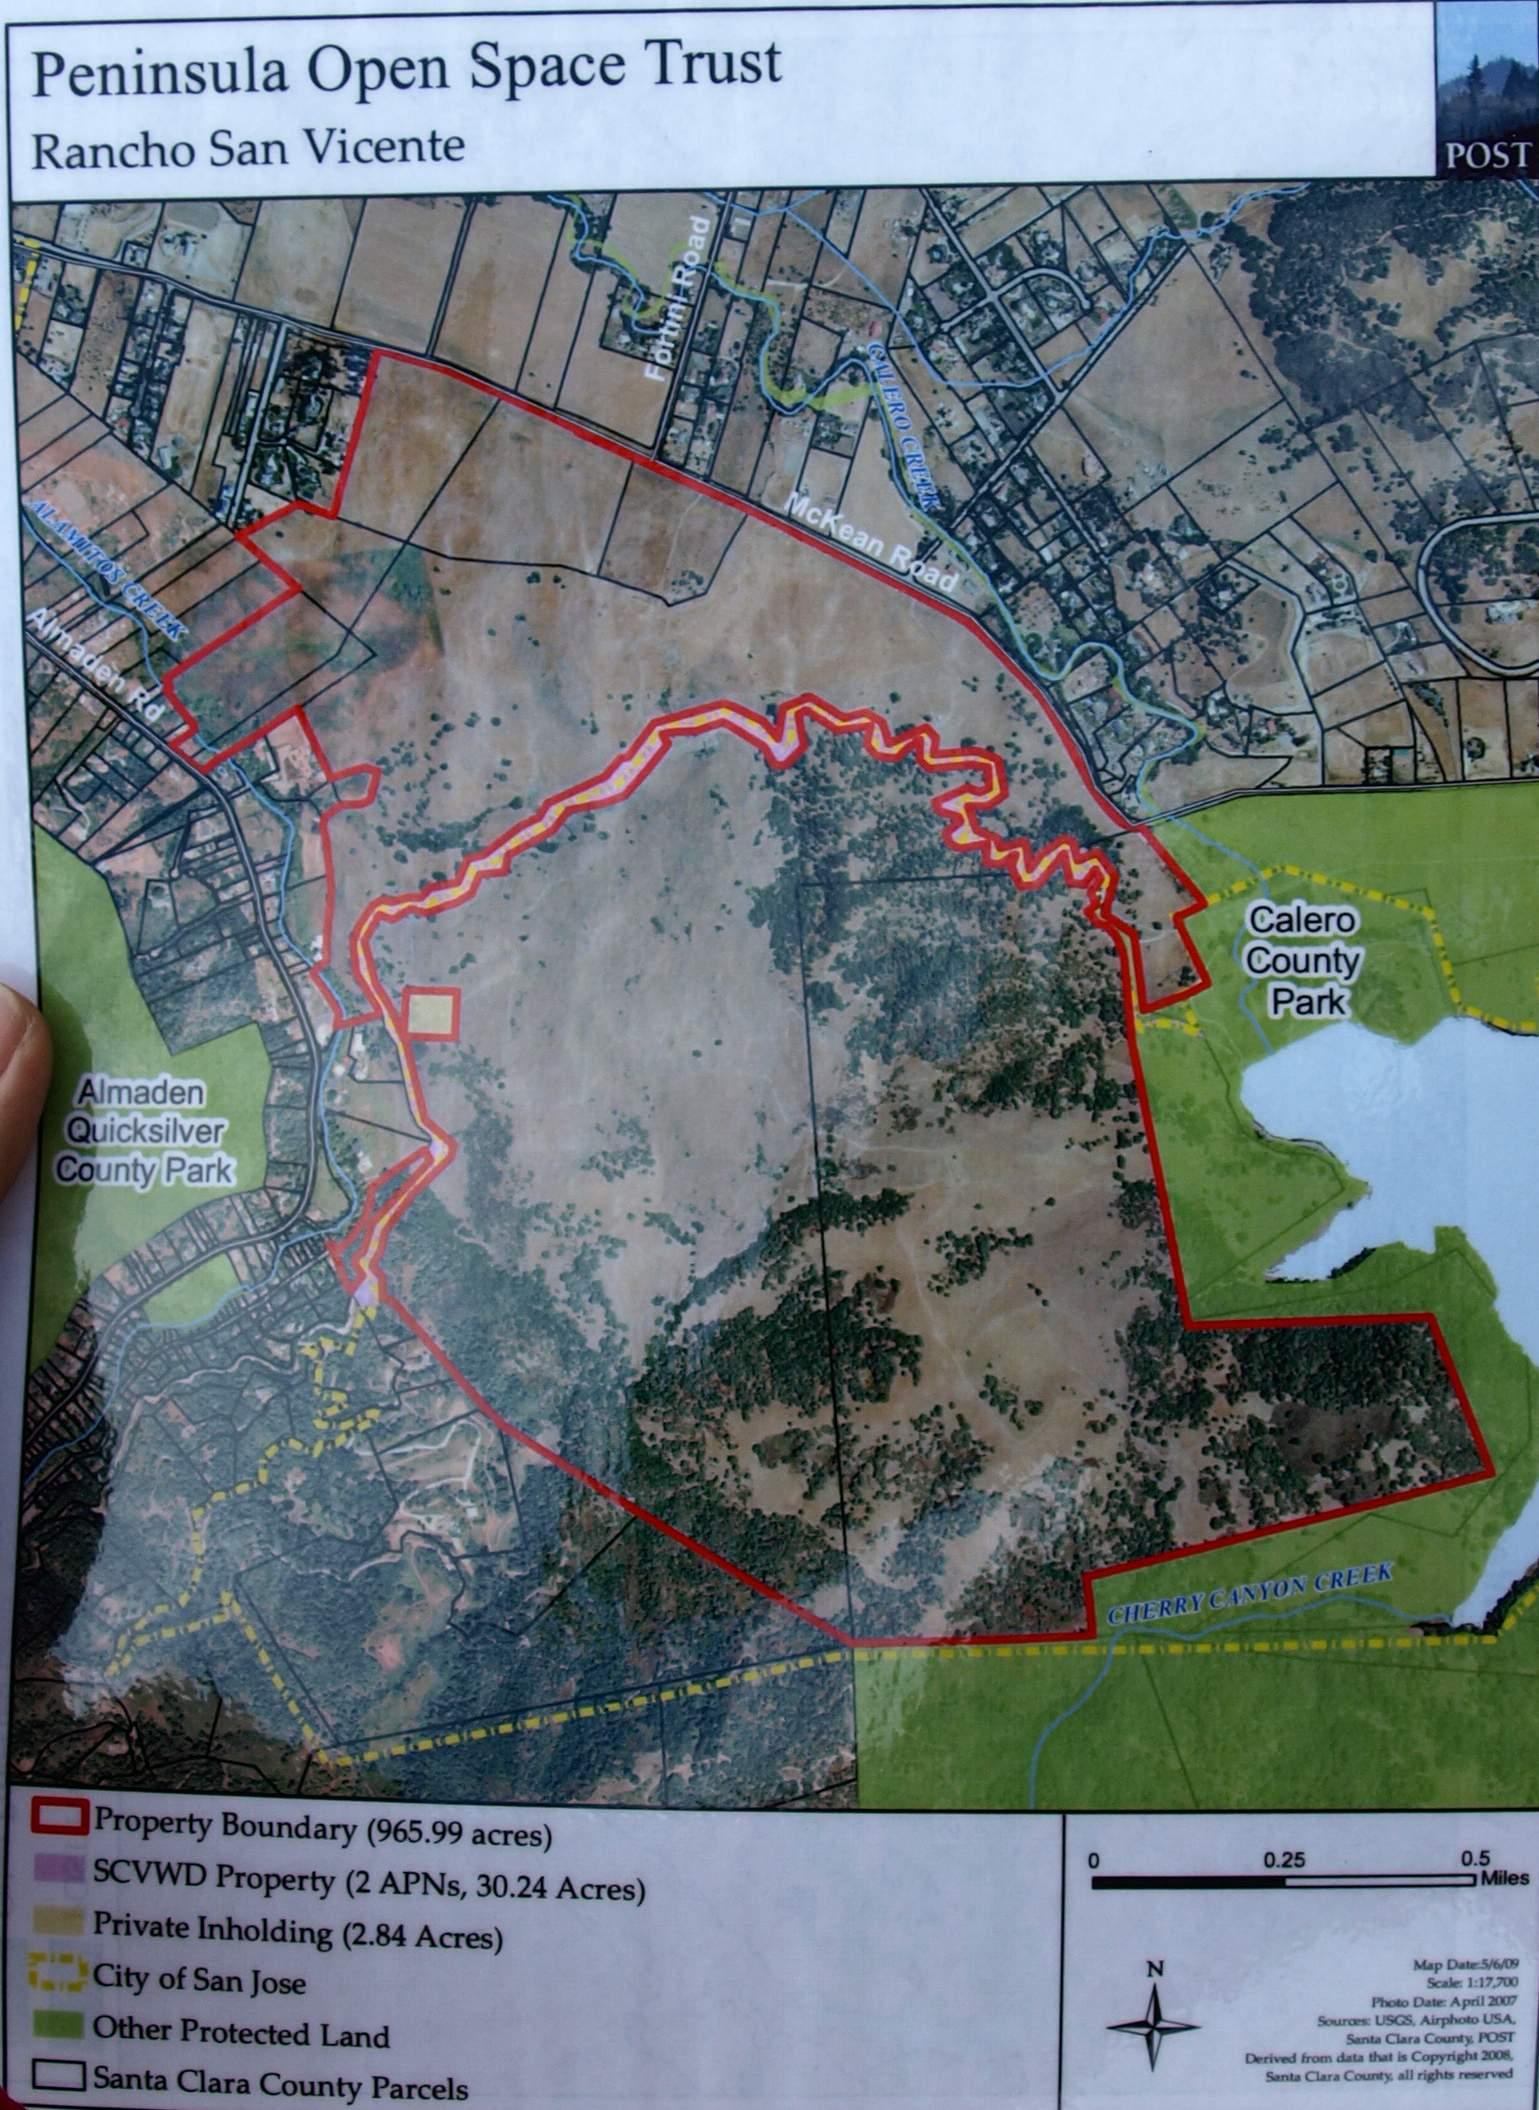 Rancho San Vicente Hike - Map of usa showing san jose